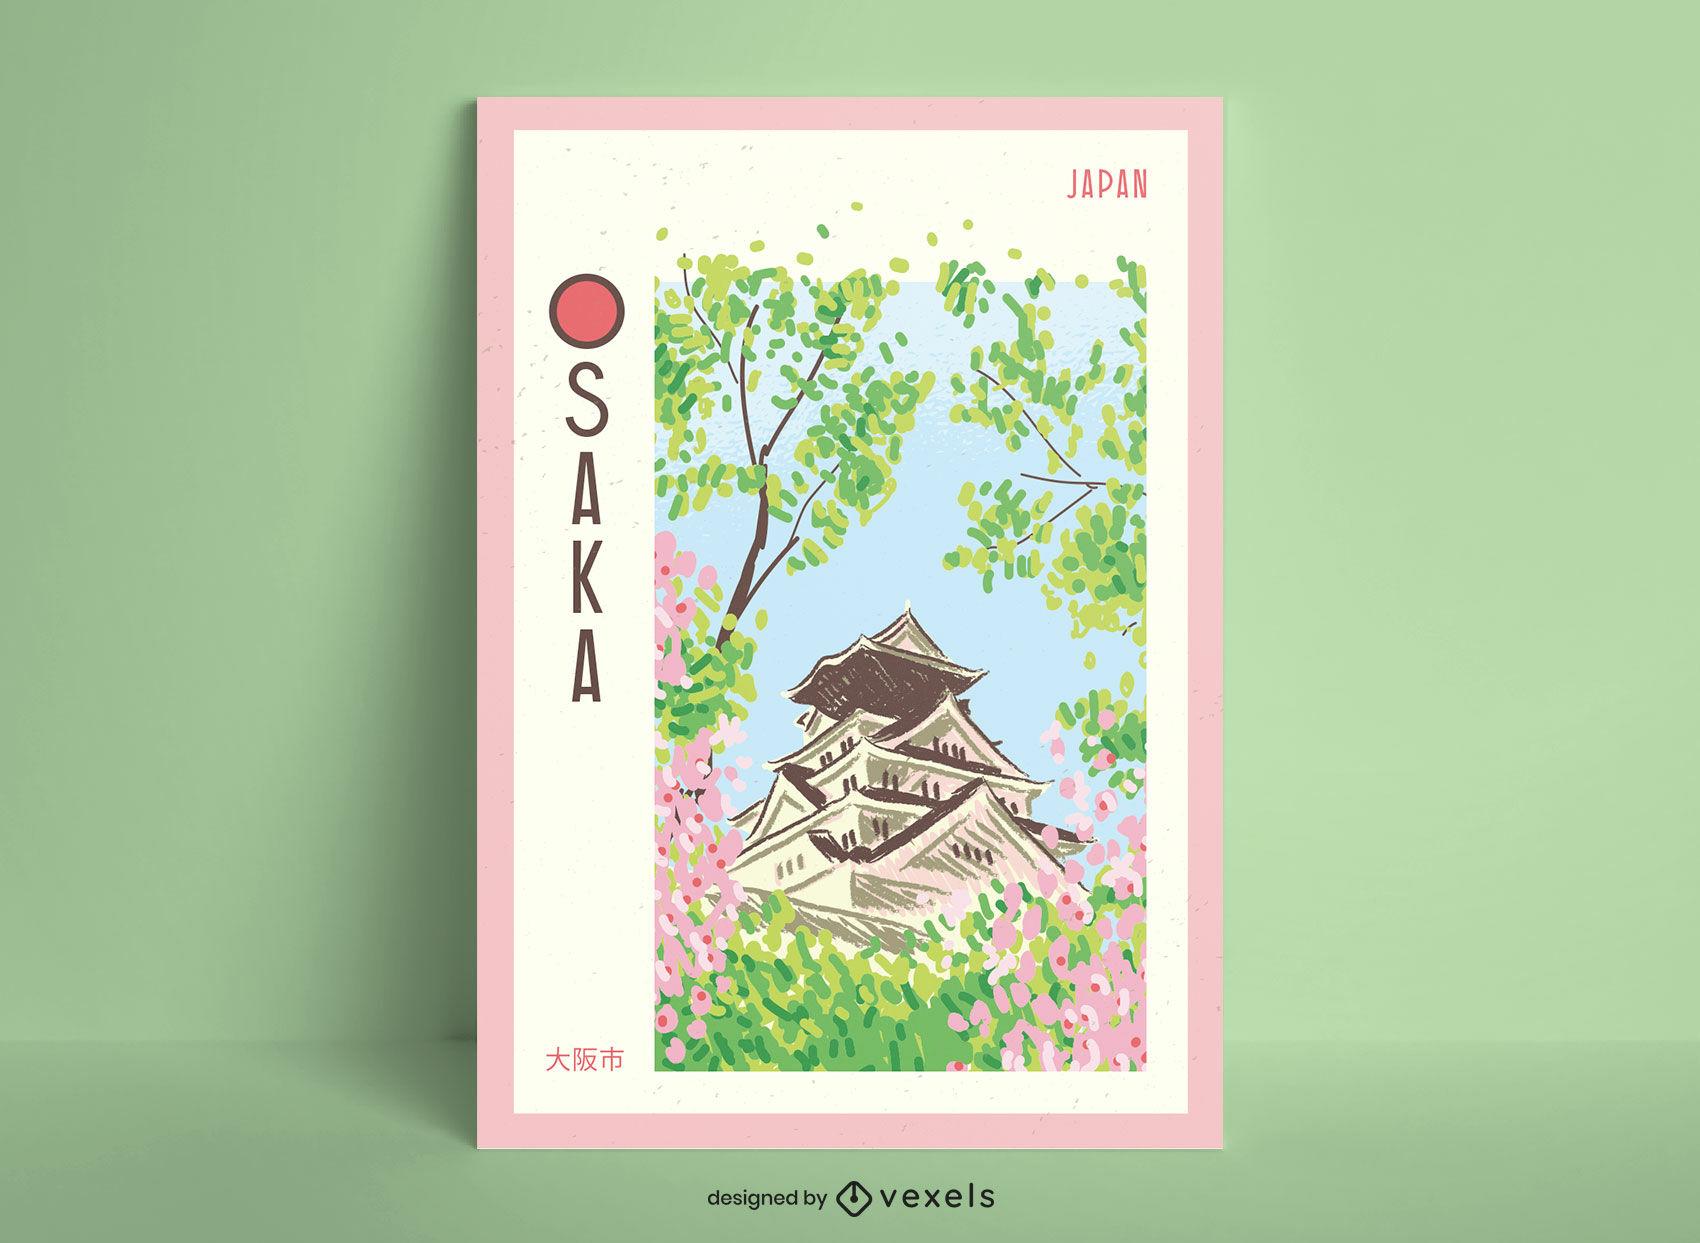 Osaka Stadt handgezeichnetes Plakatdesign